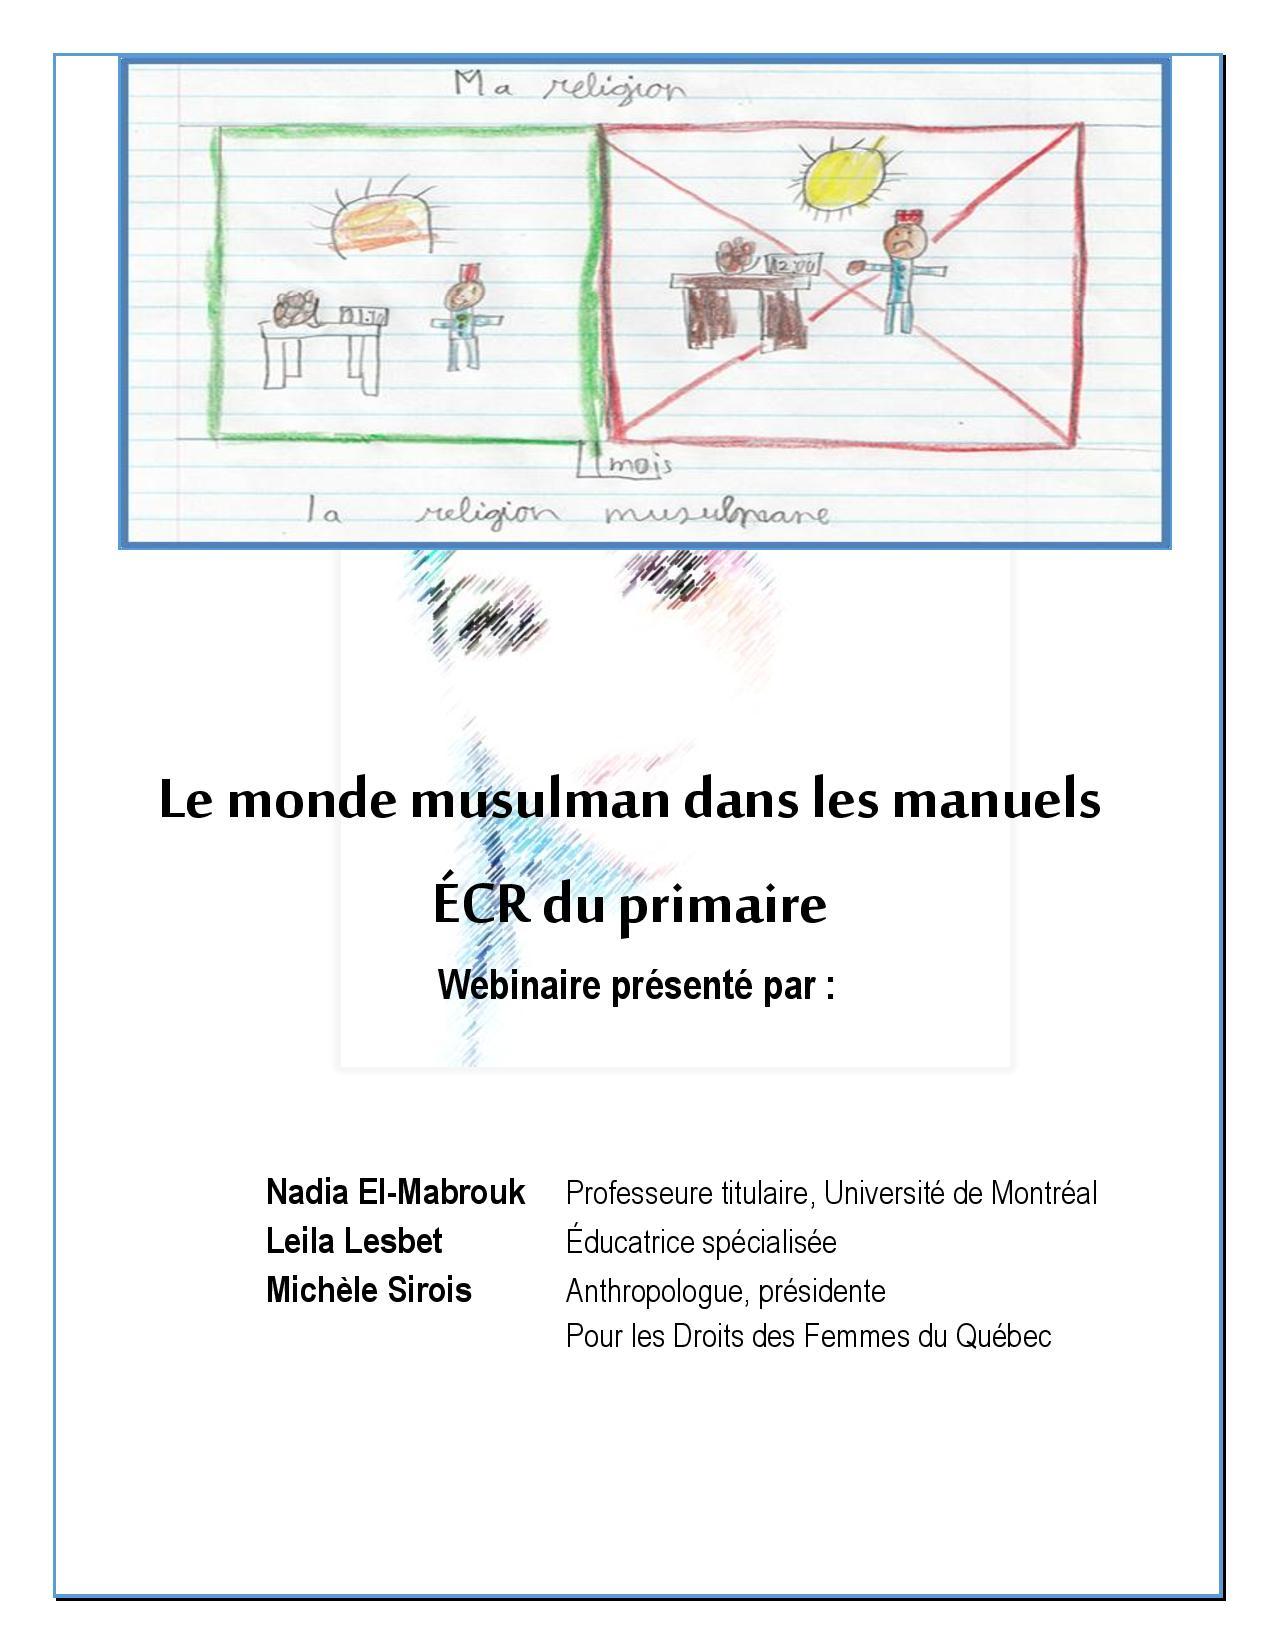 http://www.pdfquebec.org/images/Affiche_ECR_Enreg_Bordure.jpg